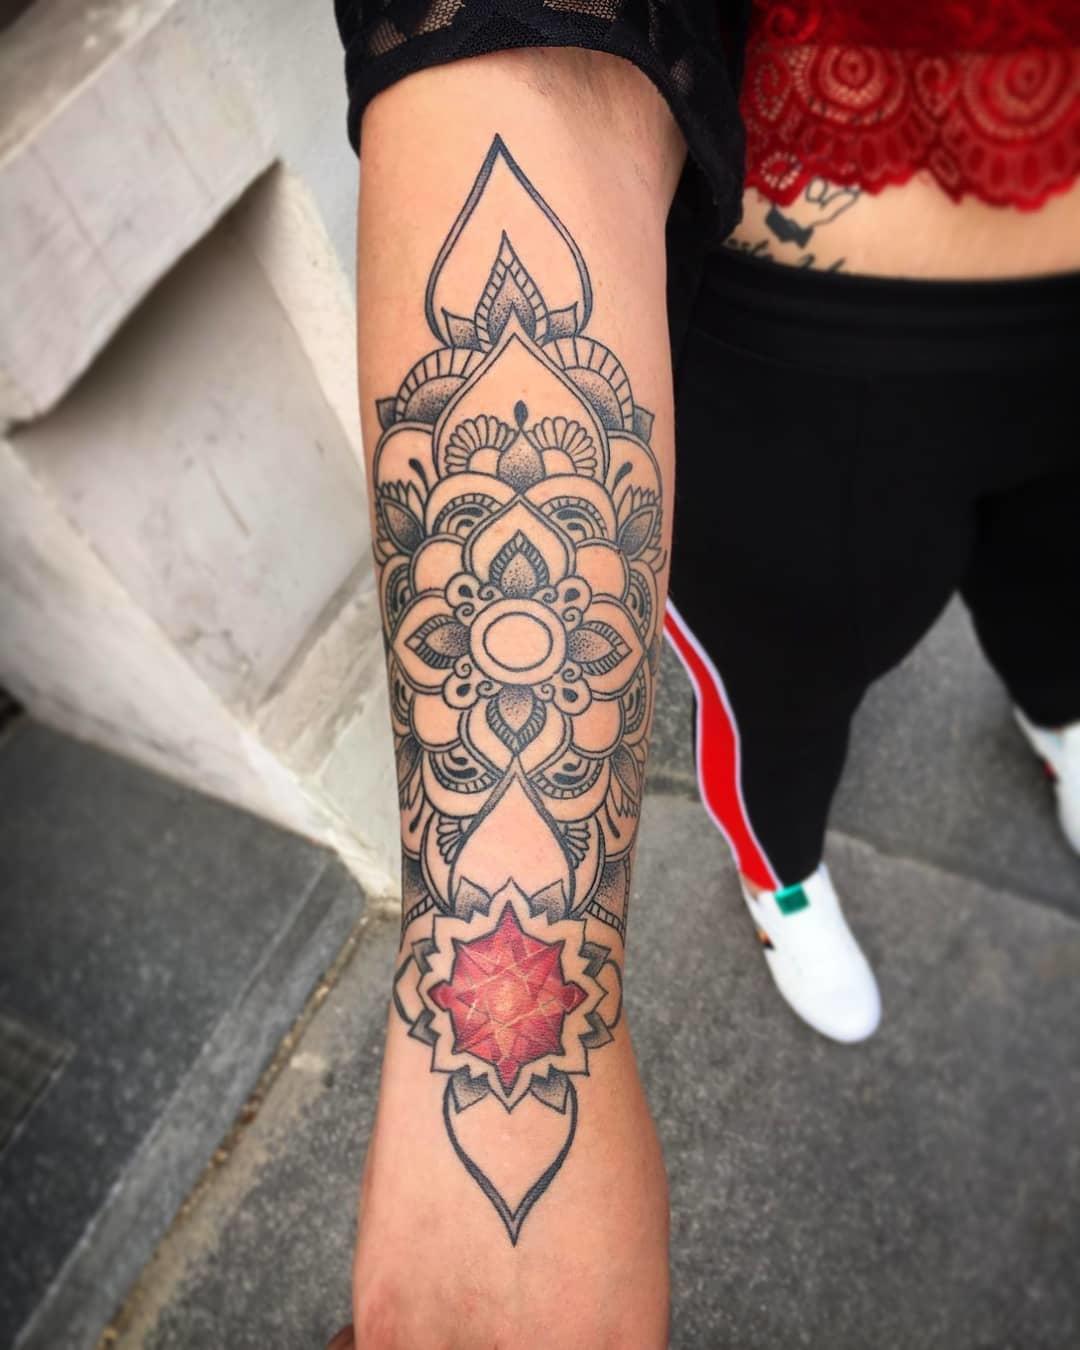 Inksearch tattoo Natalie Z